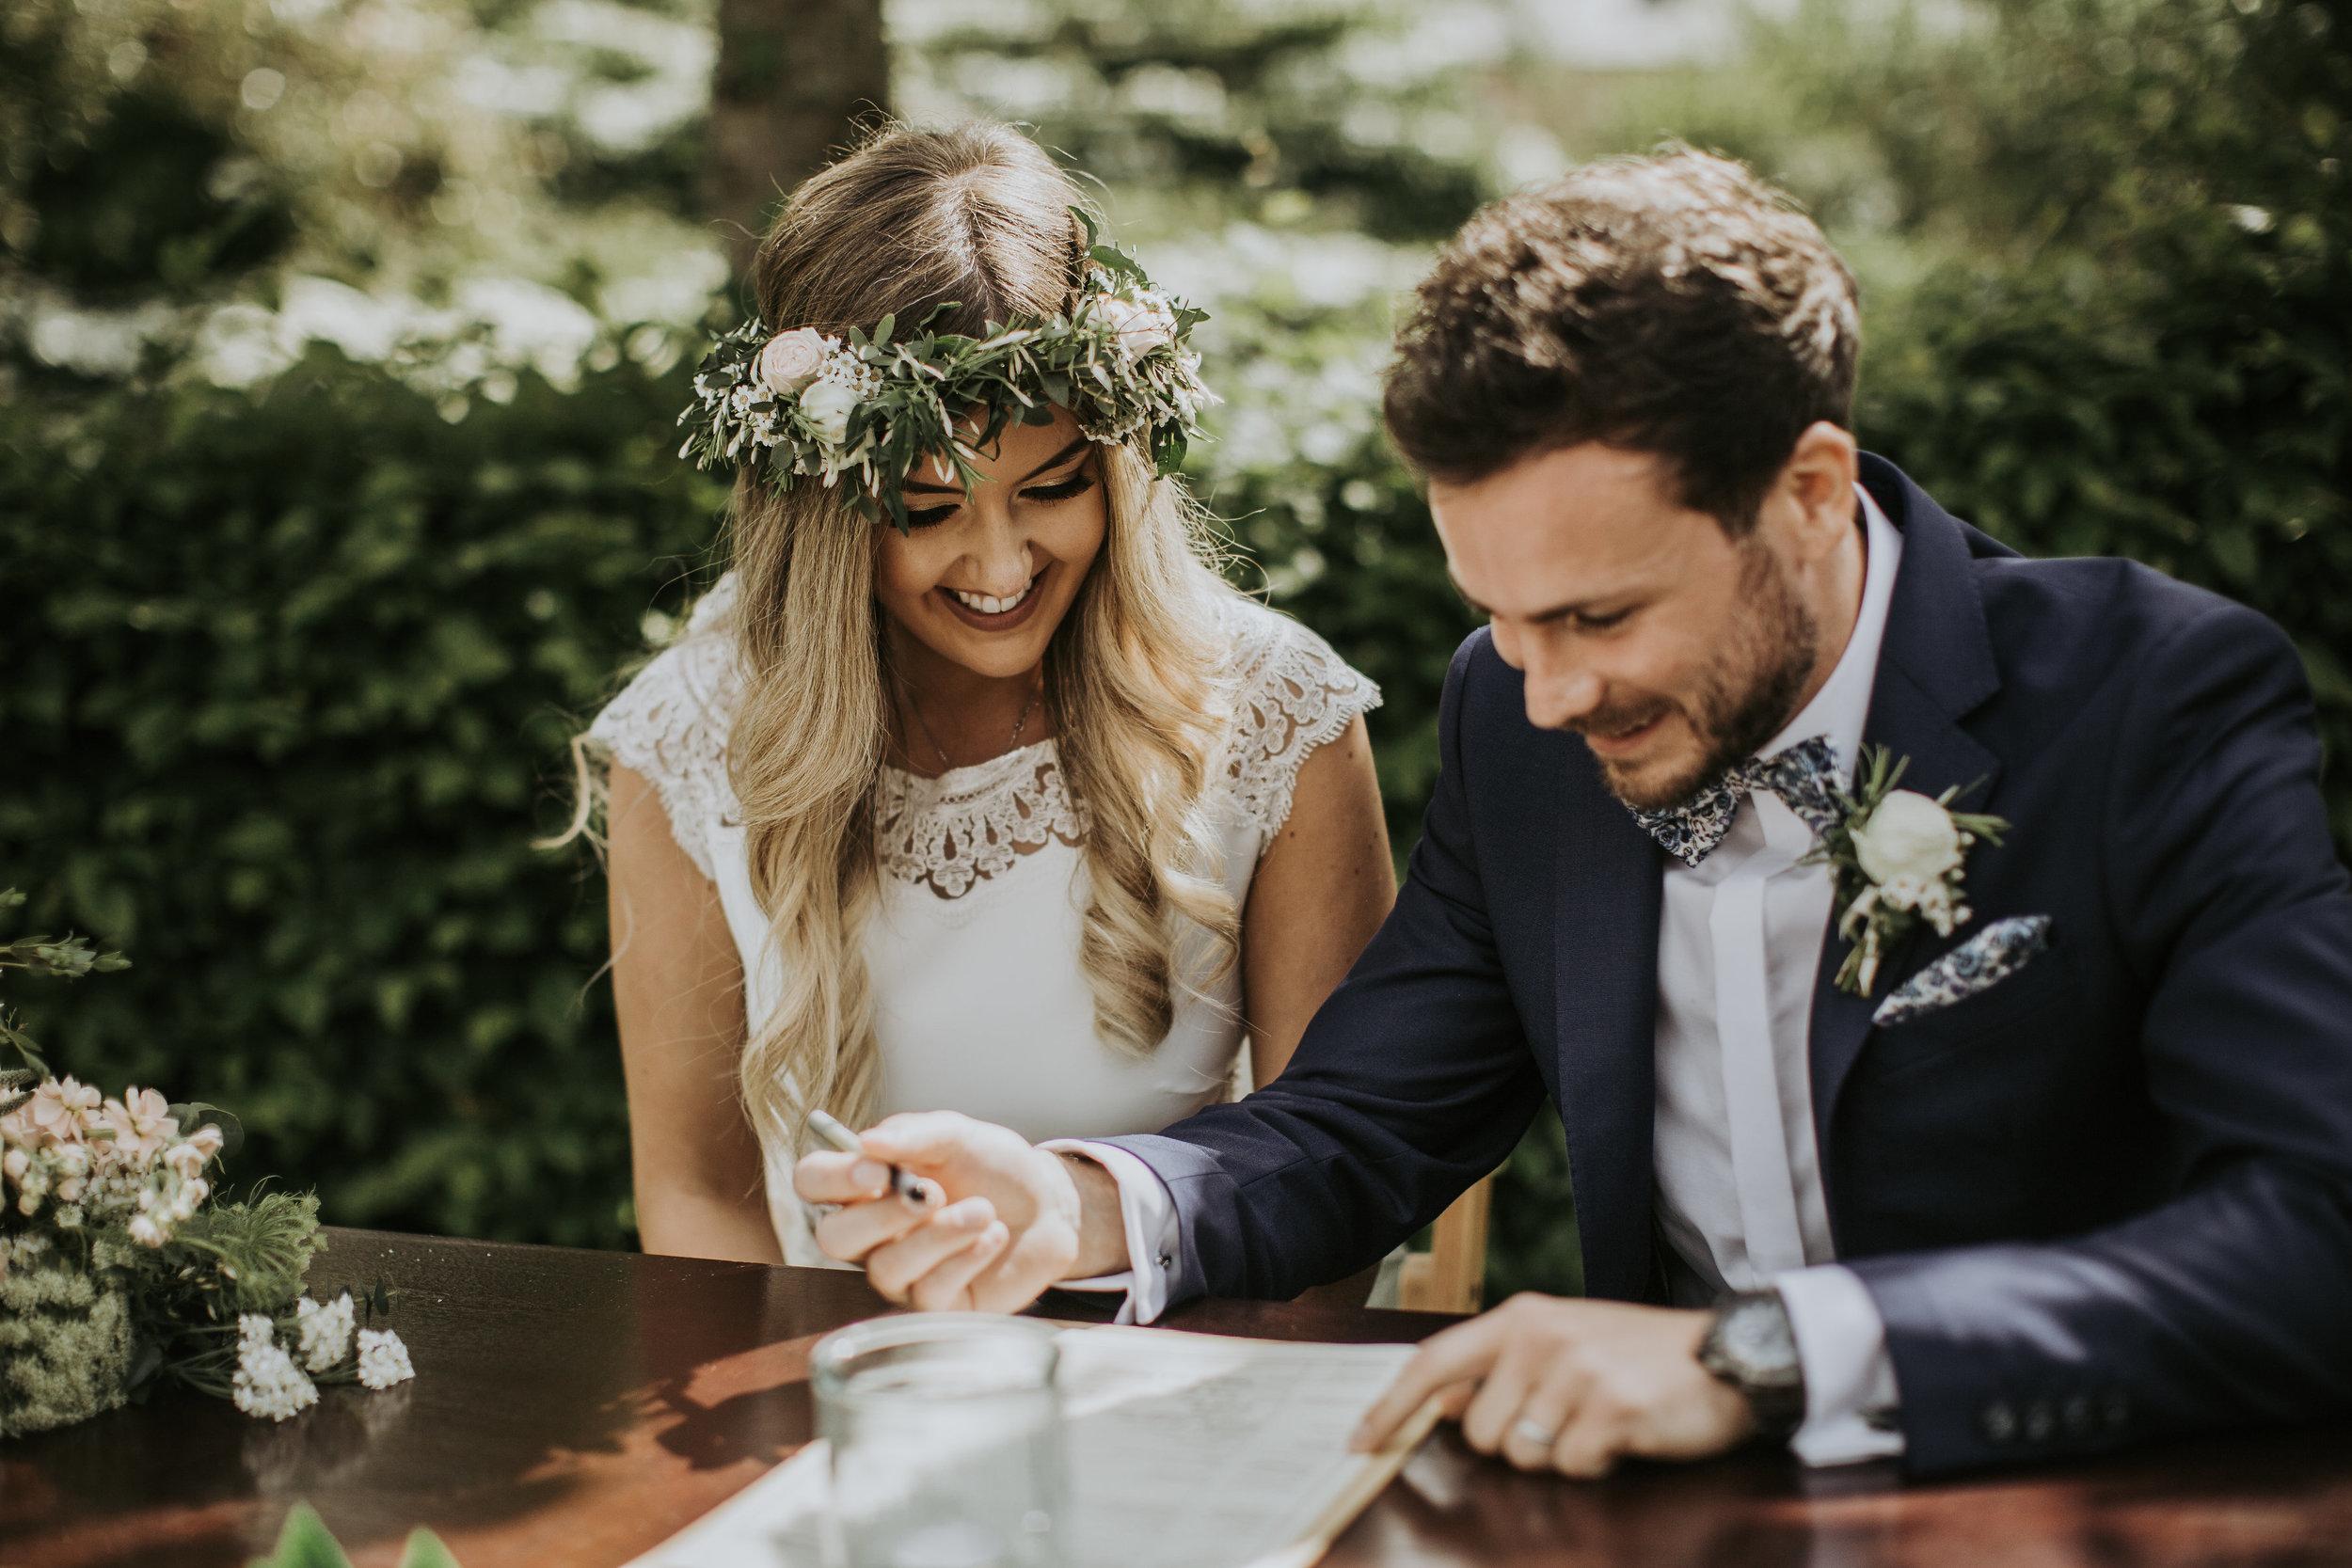 Bruidspaar tekent de trouwakte